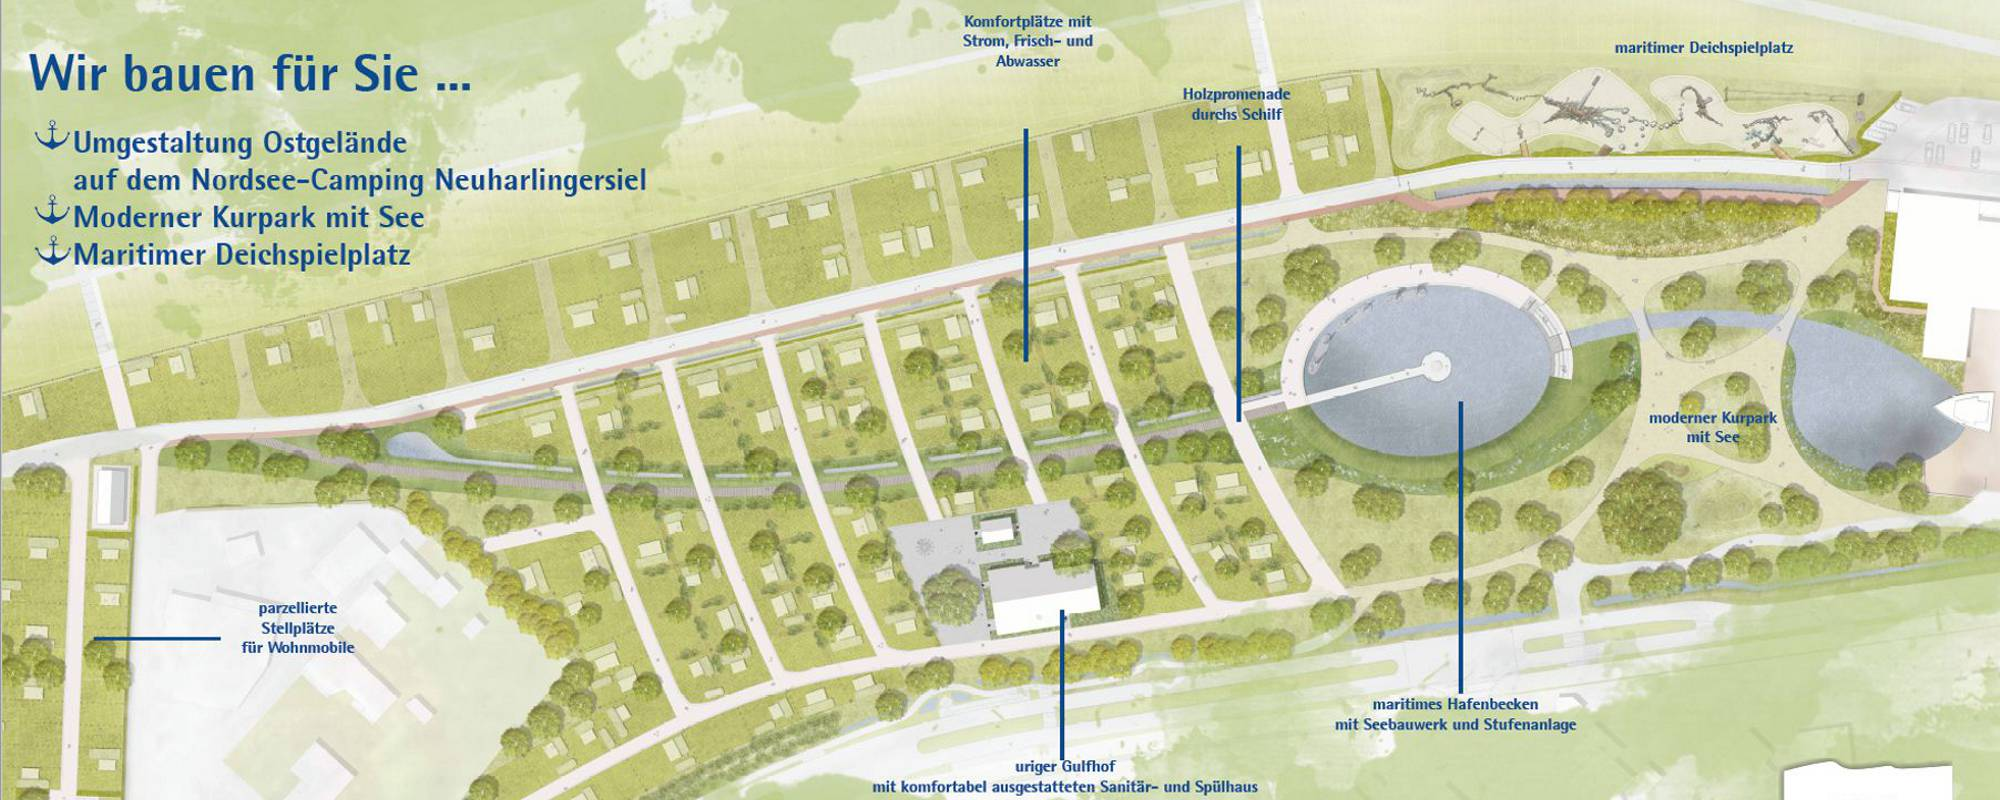 Umgestaltung Nordsee Campingplatz Neuharlingersiel